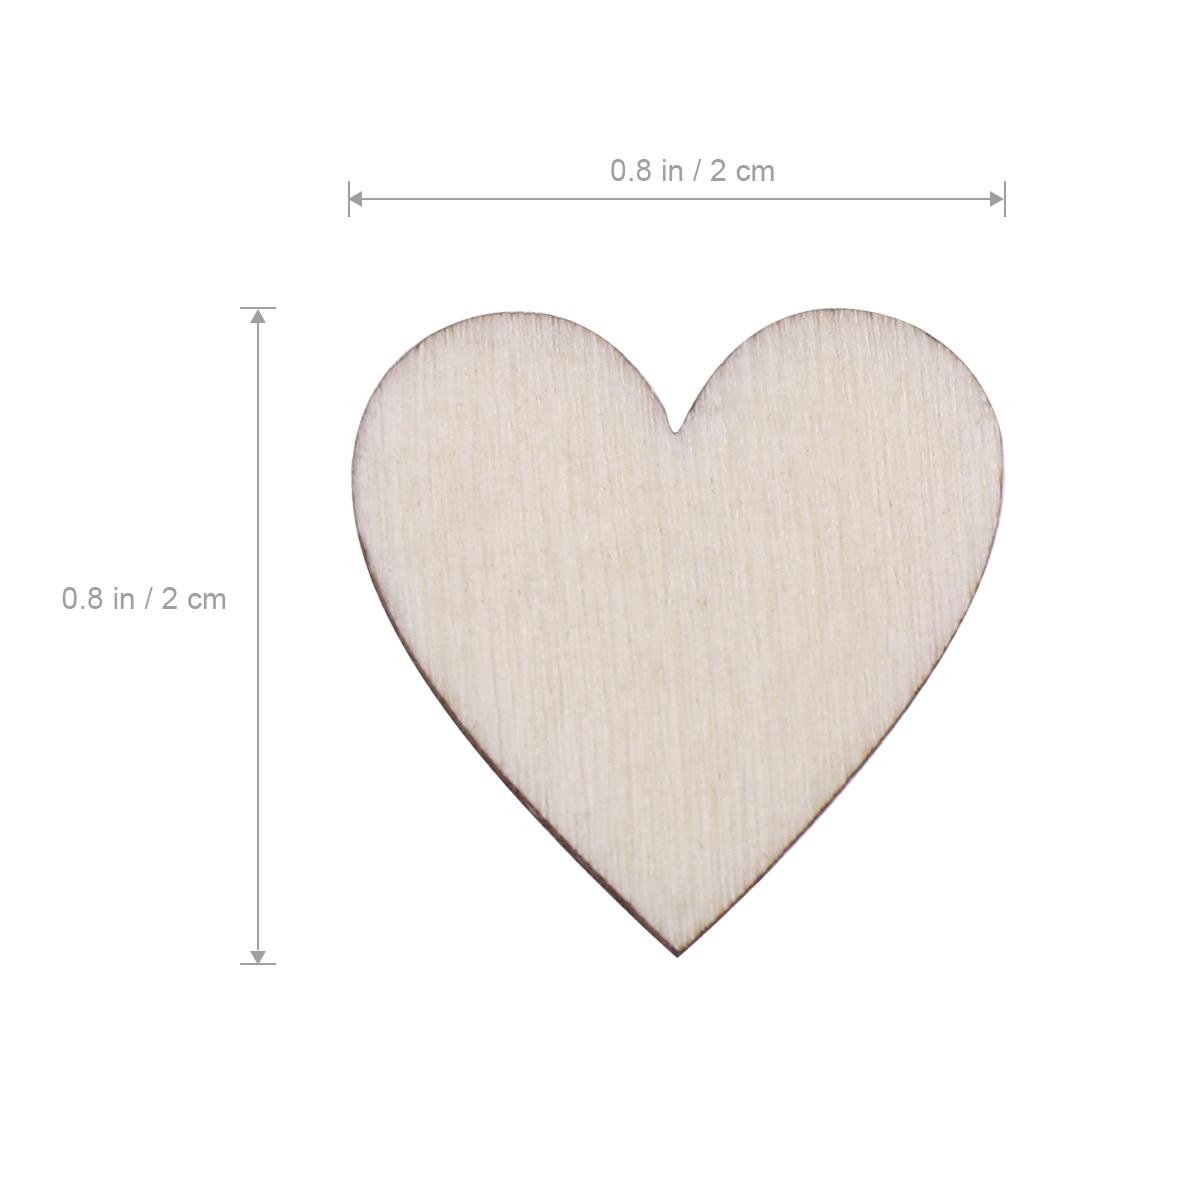 50pcs Love Heart Shape Wooden Pieces DIY Craft for Rustic Wedding Decor